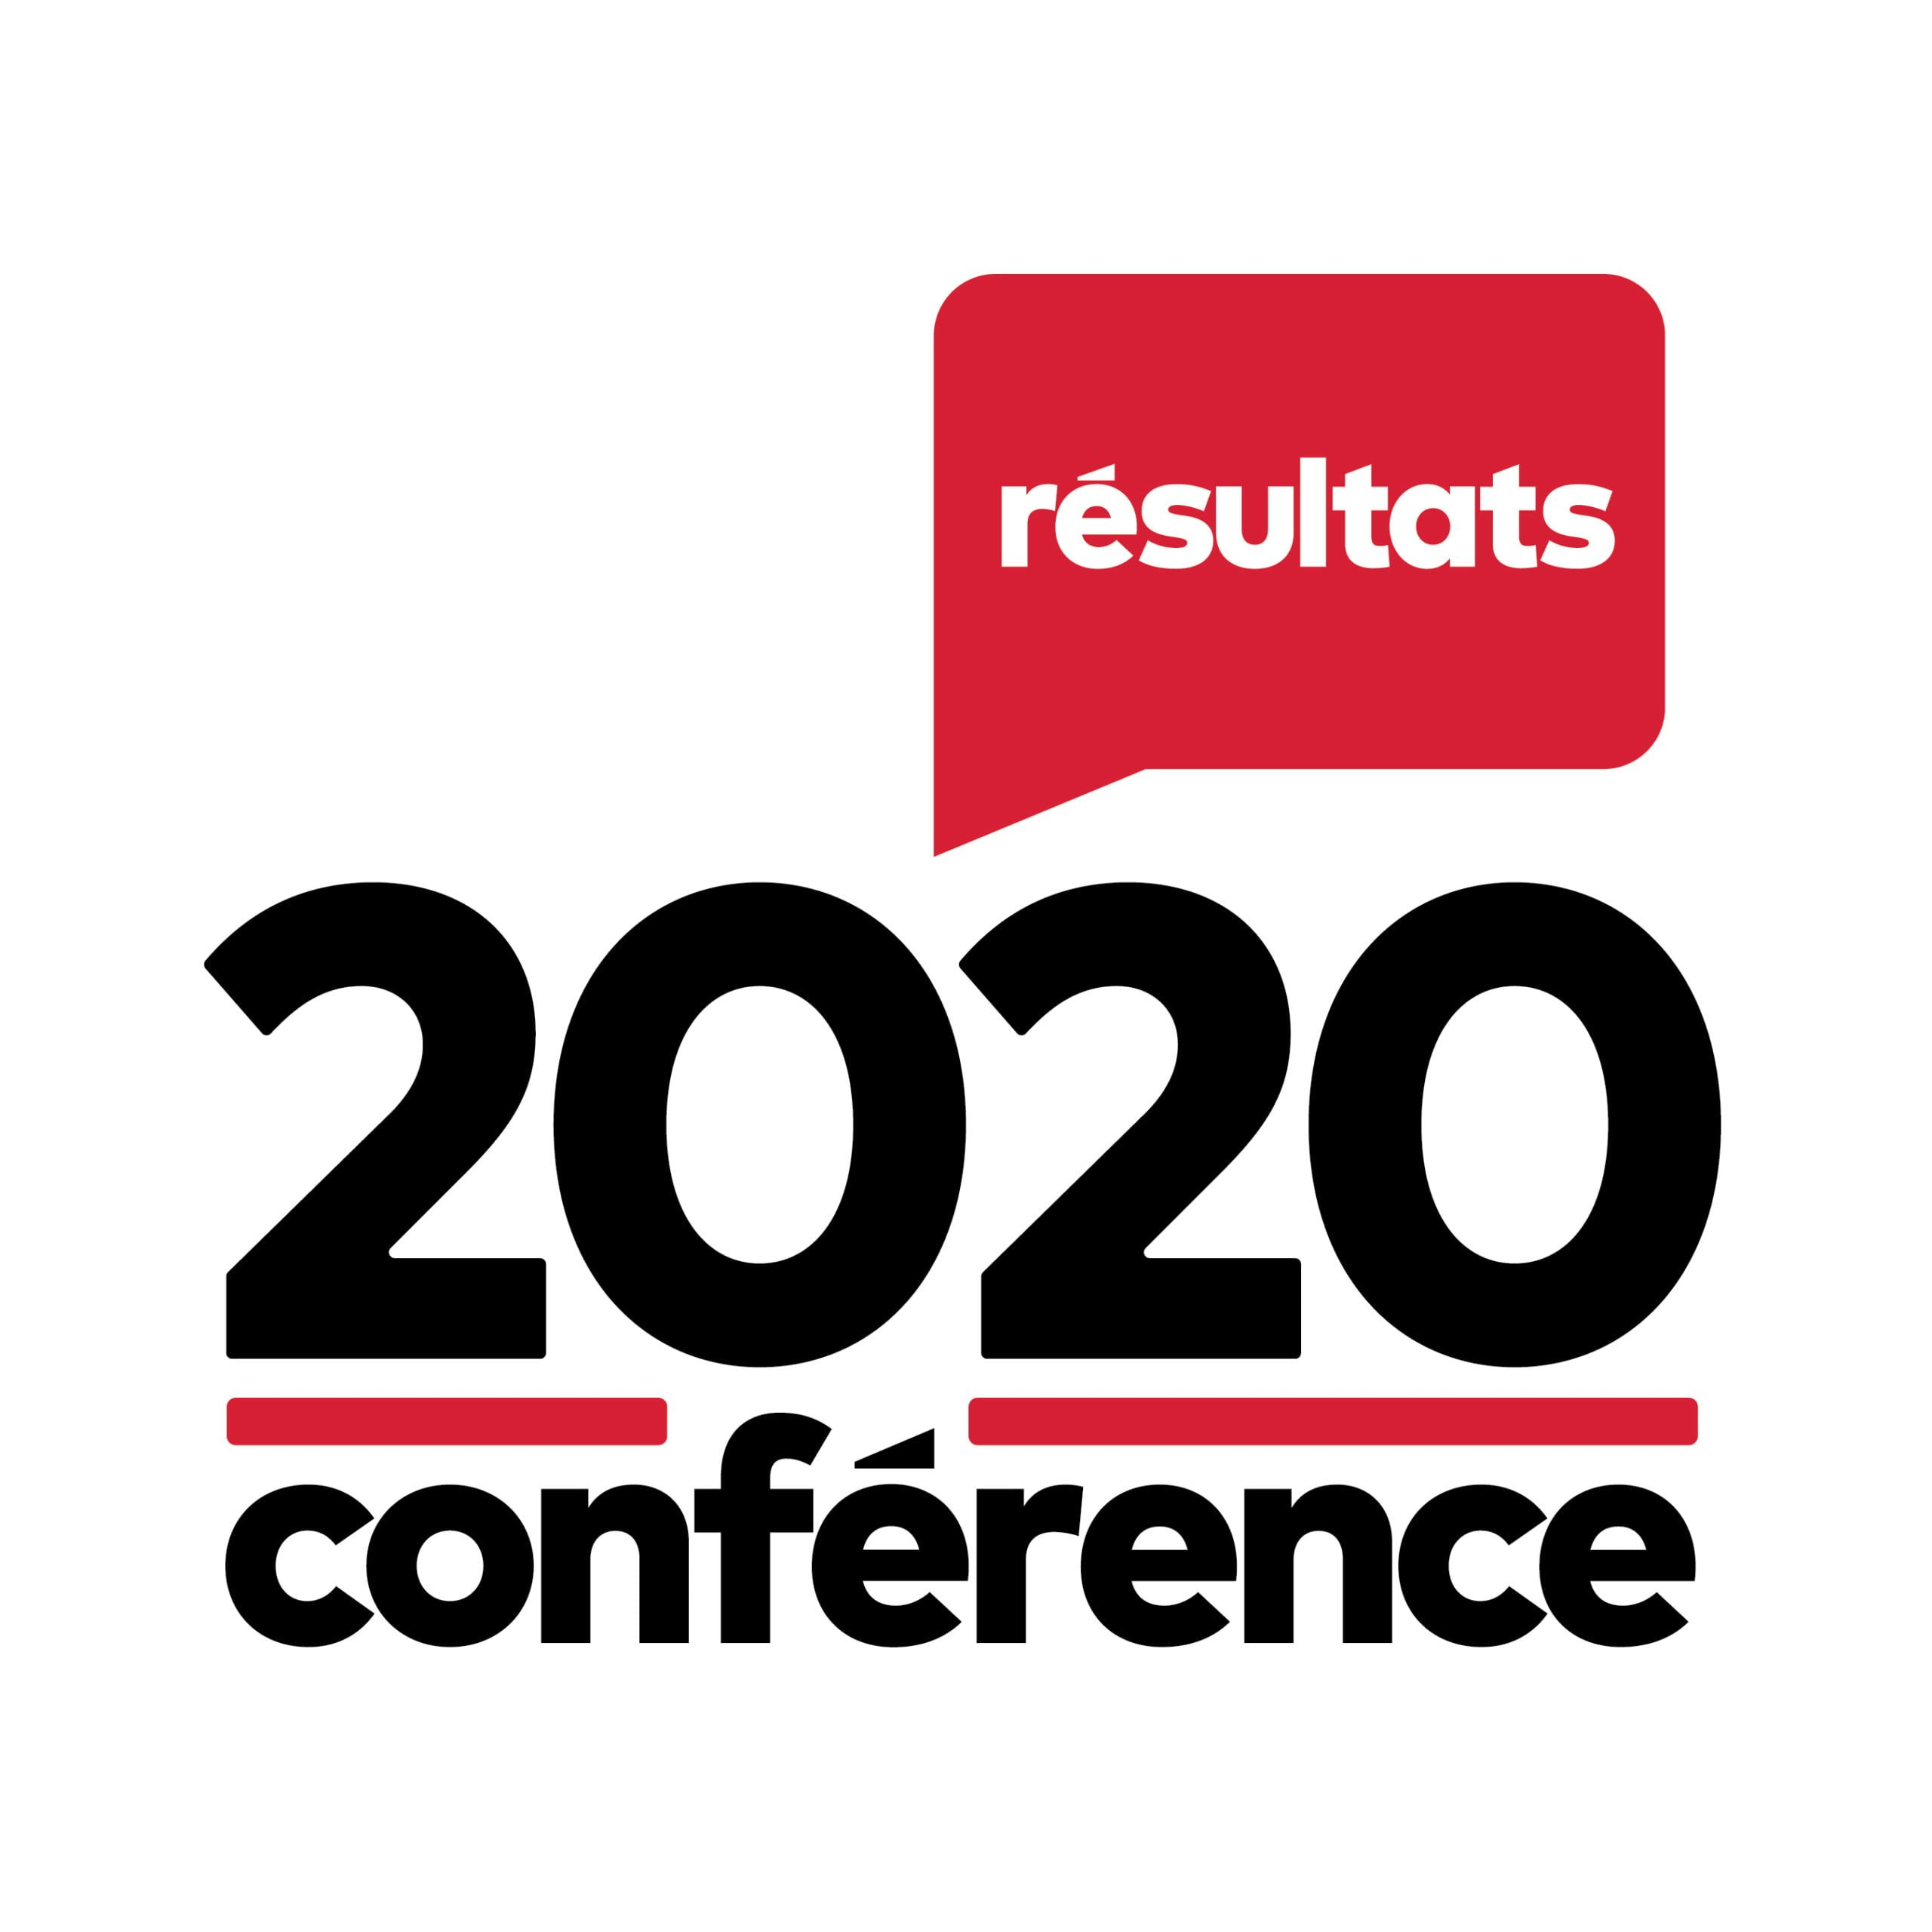 Resultats Conference logo